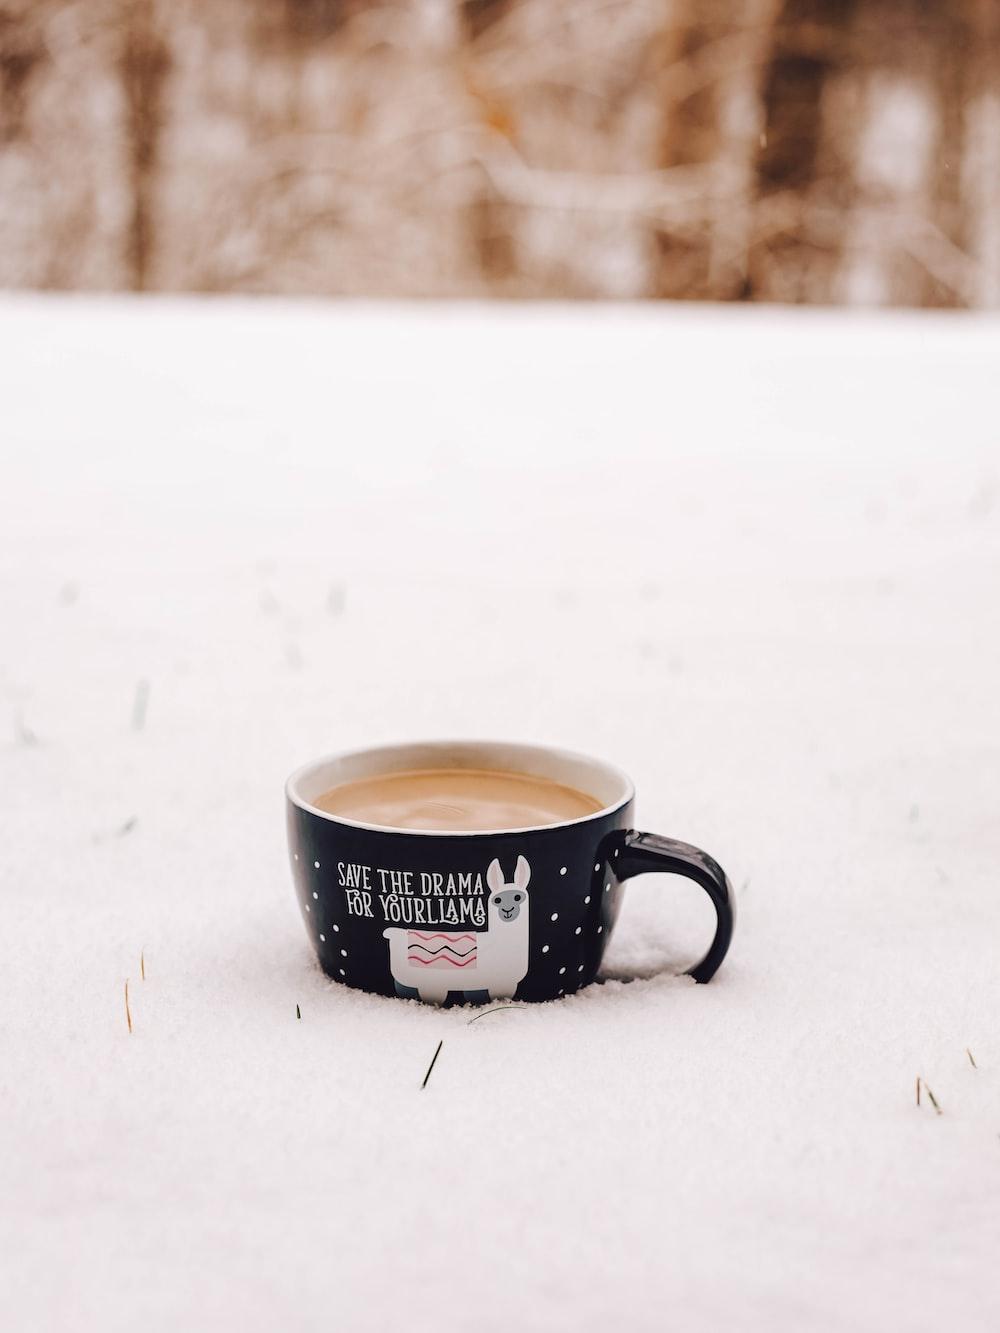 white and black ceramic mug on snow covered ground